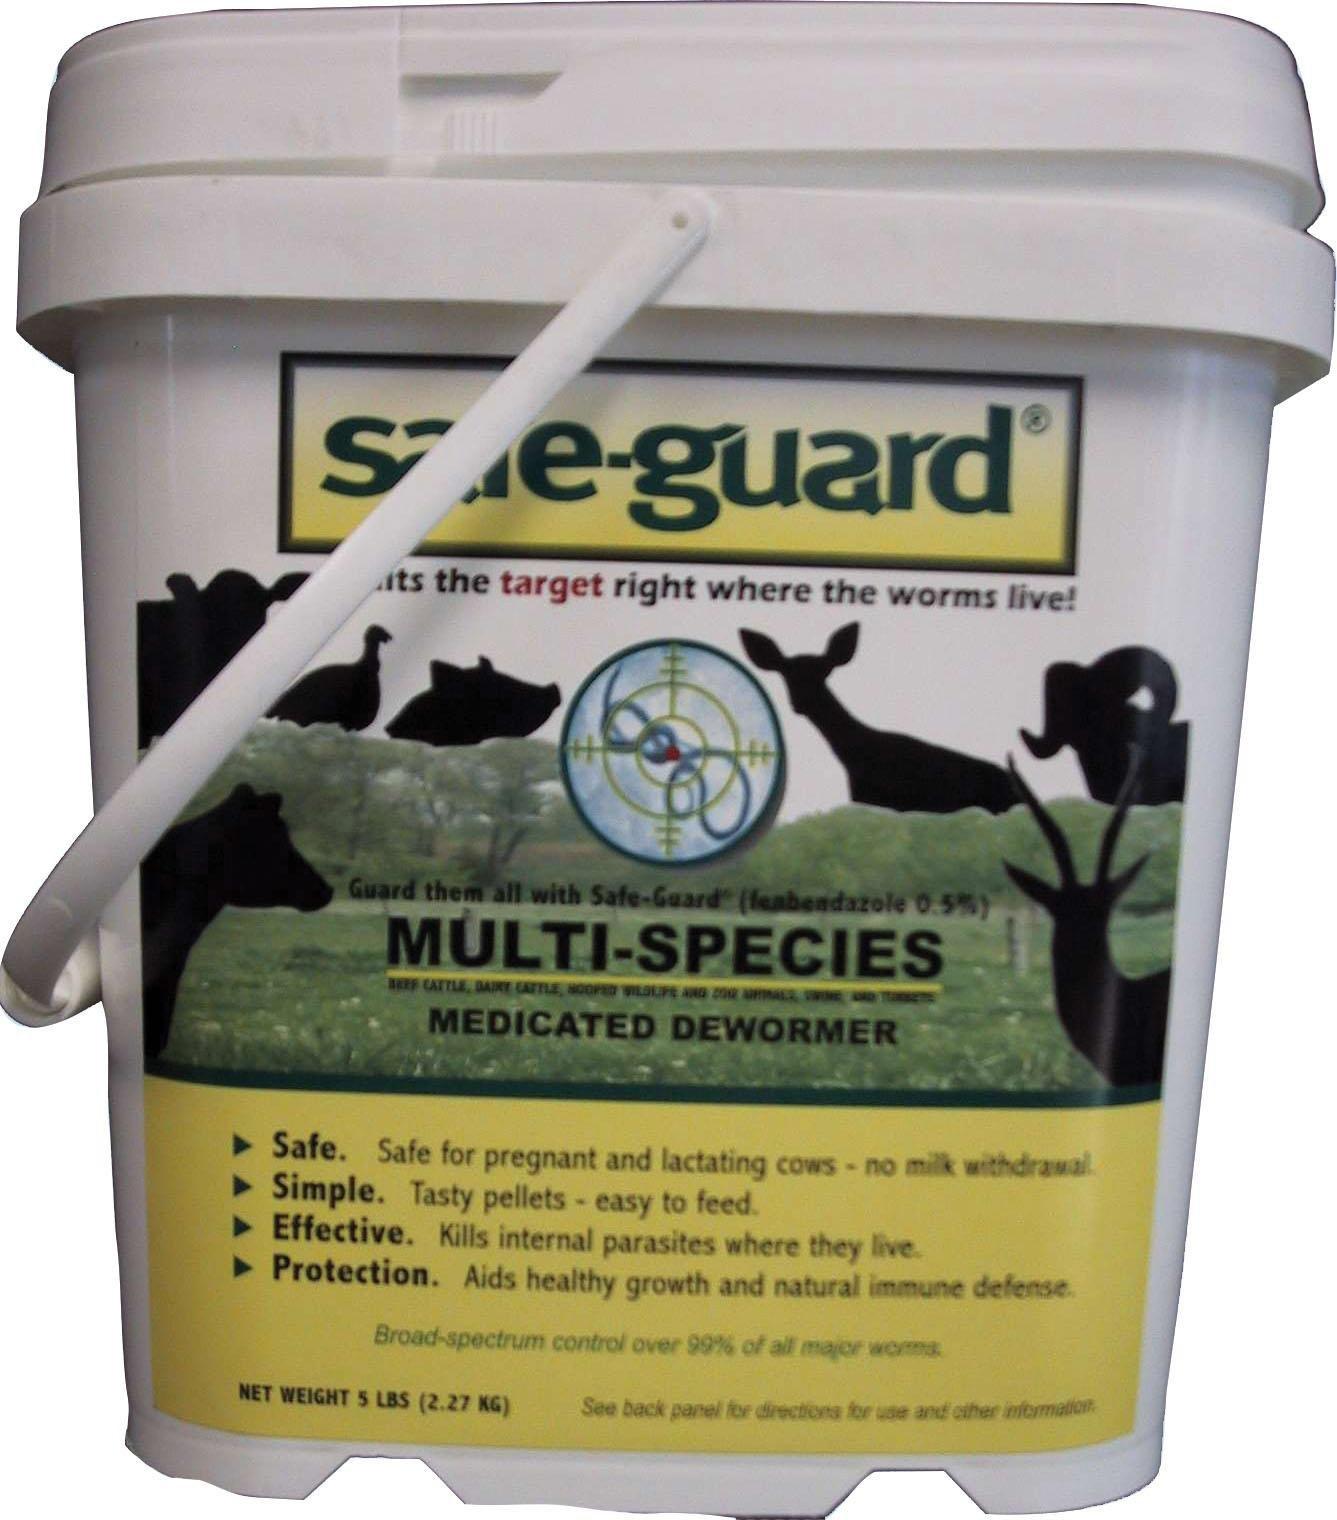 MERCK ANIMAL HEALTH MFG Safe-Guard 0.50% Multi-Species Dewormer 5 POUND